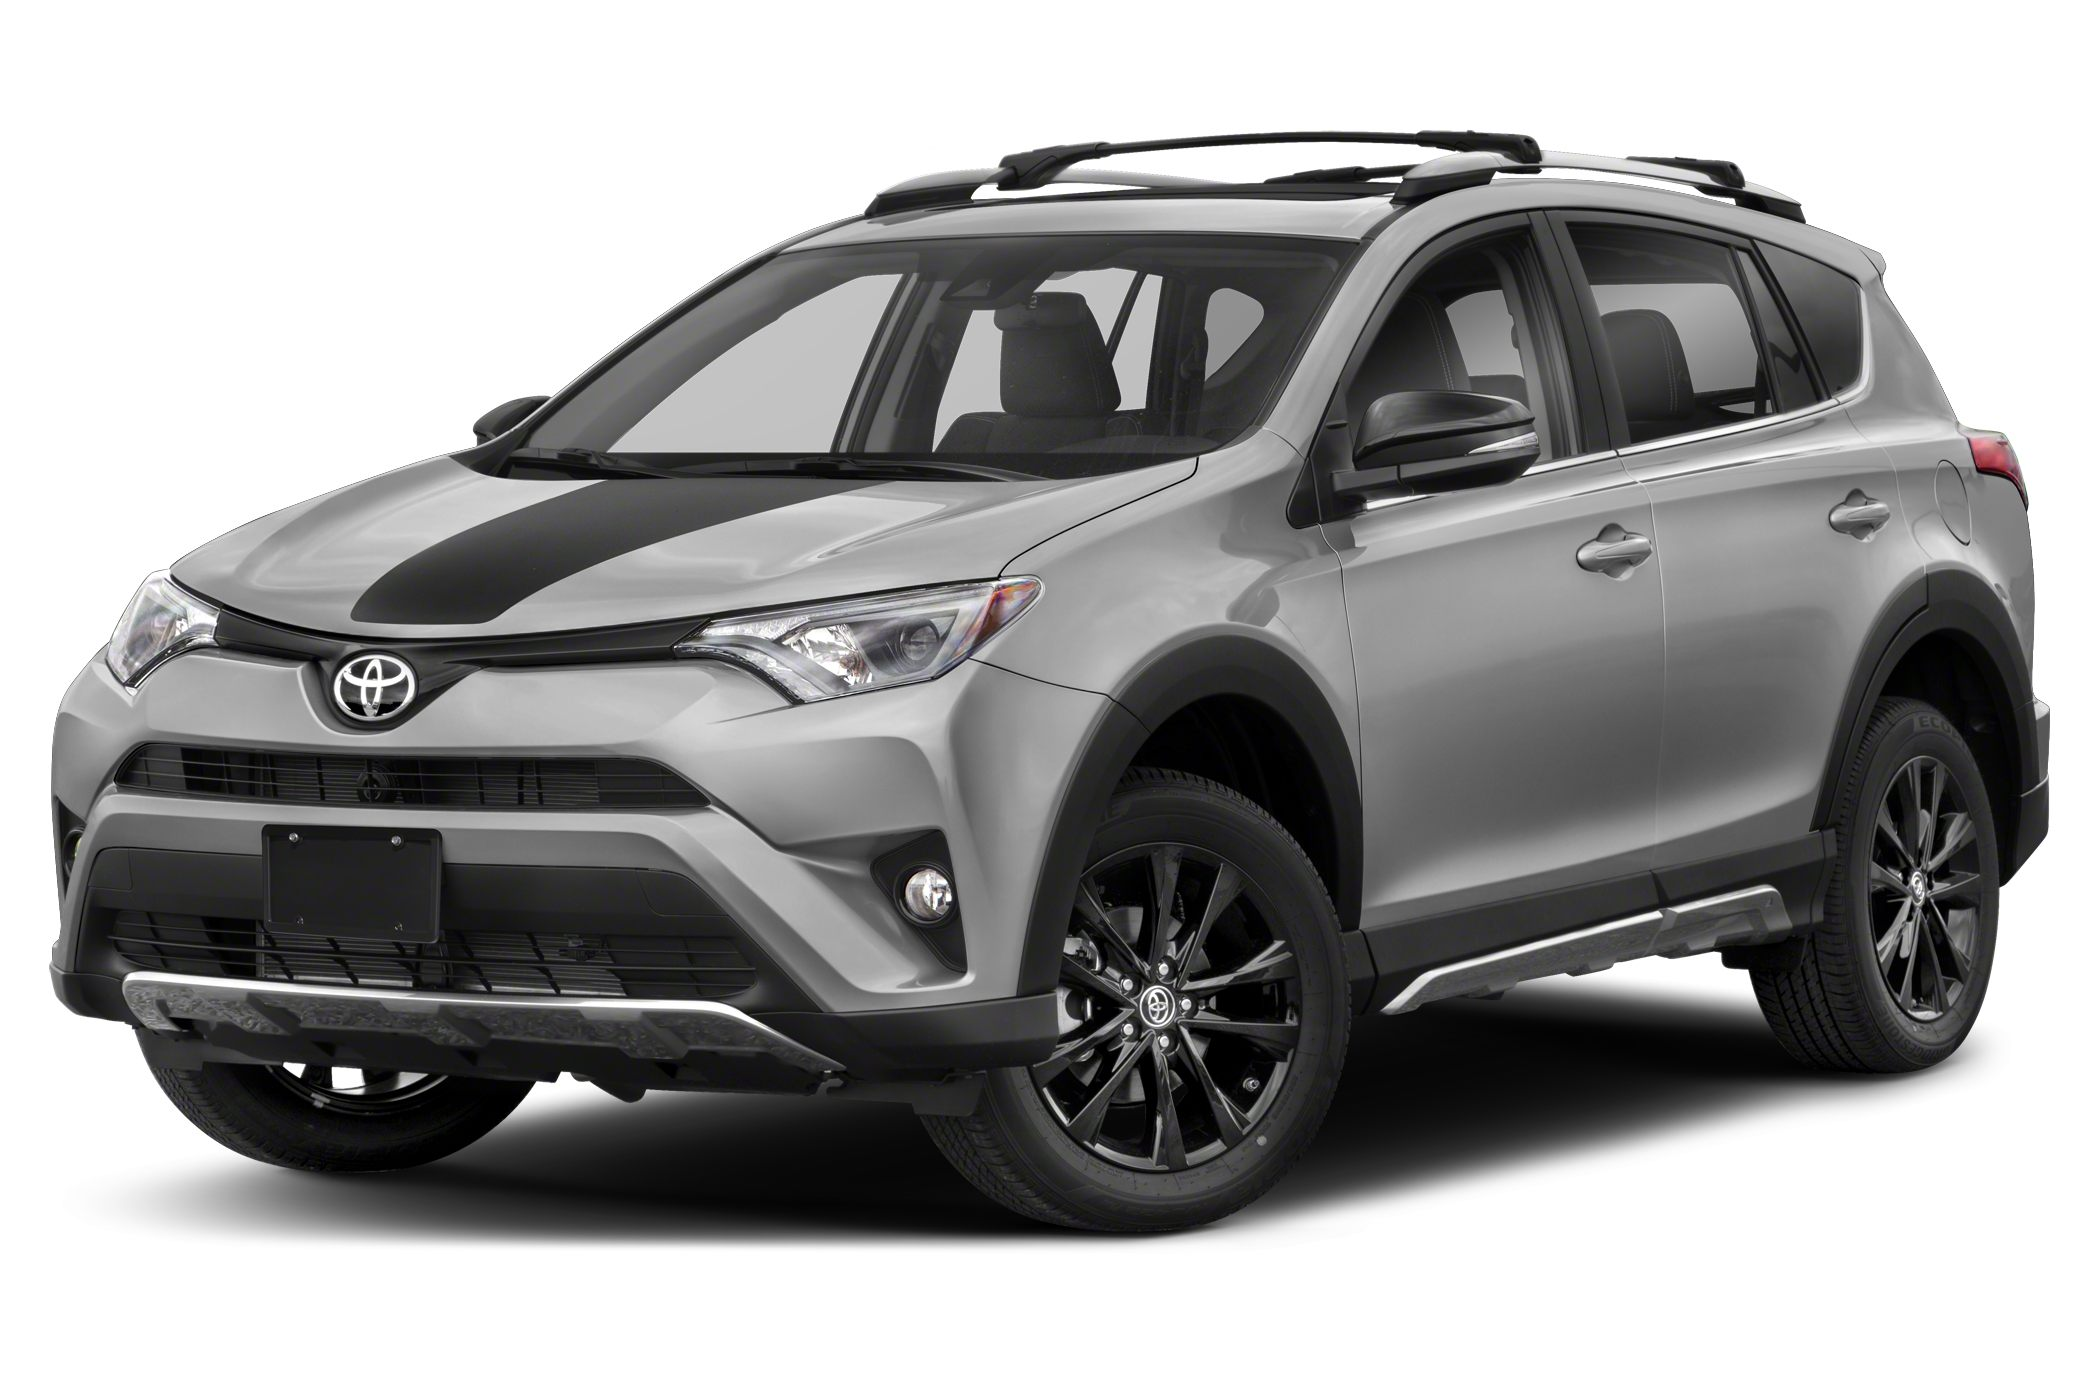 Adventure 4dr All Wheel Drive 2018 Toyota Rav4 Photos